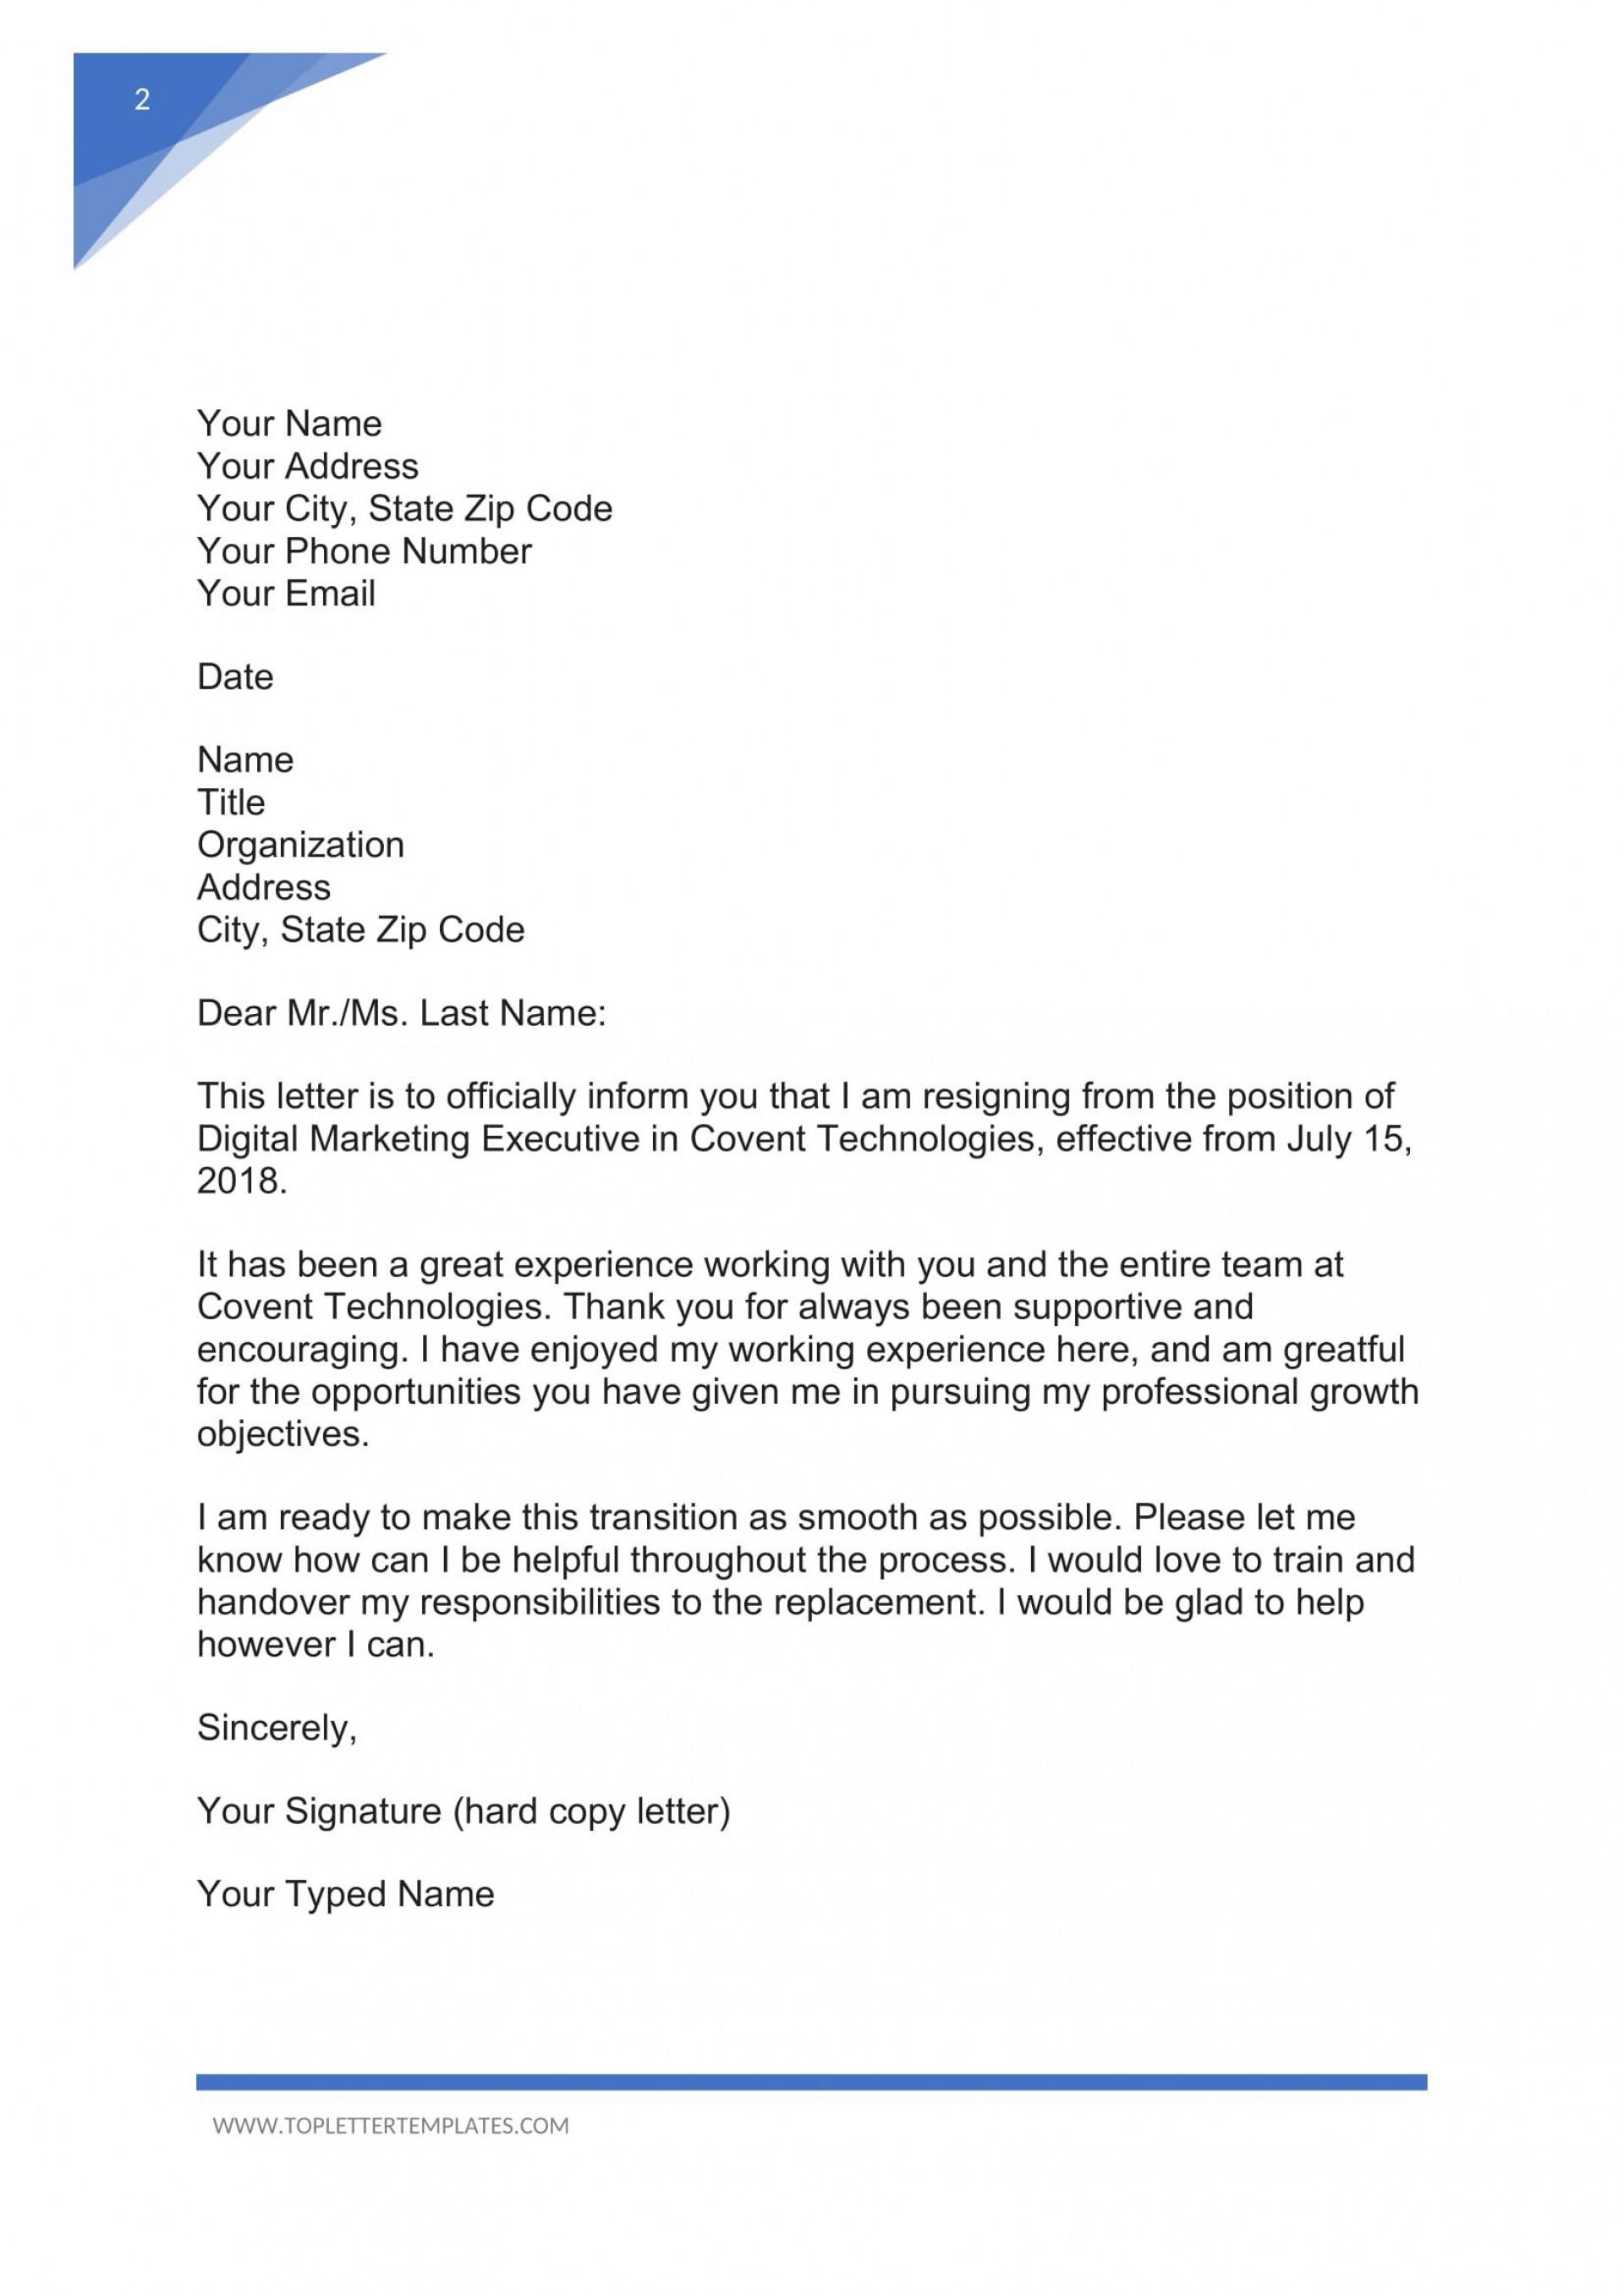 006 Impressive Resignation Letter Template Word Concept  Malaysia Uk1920